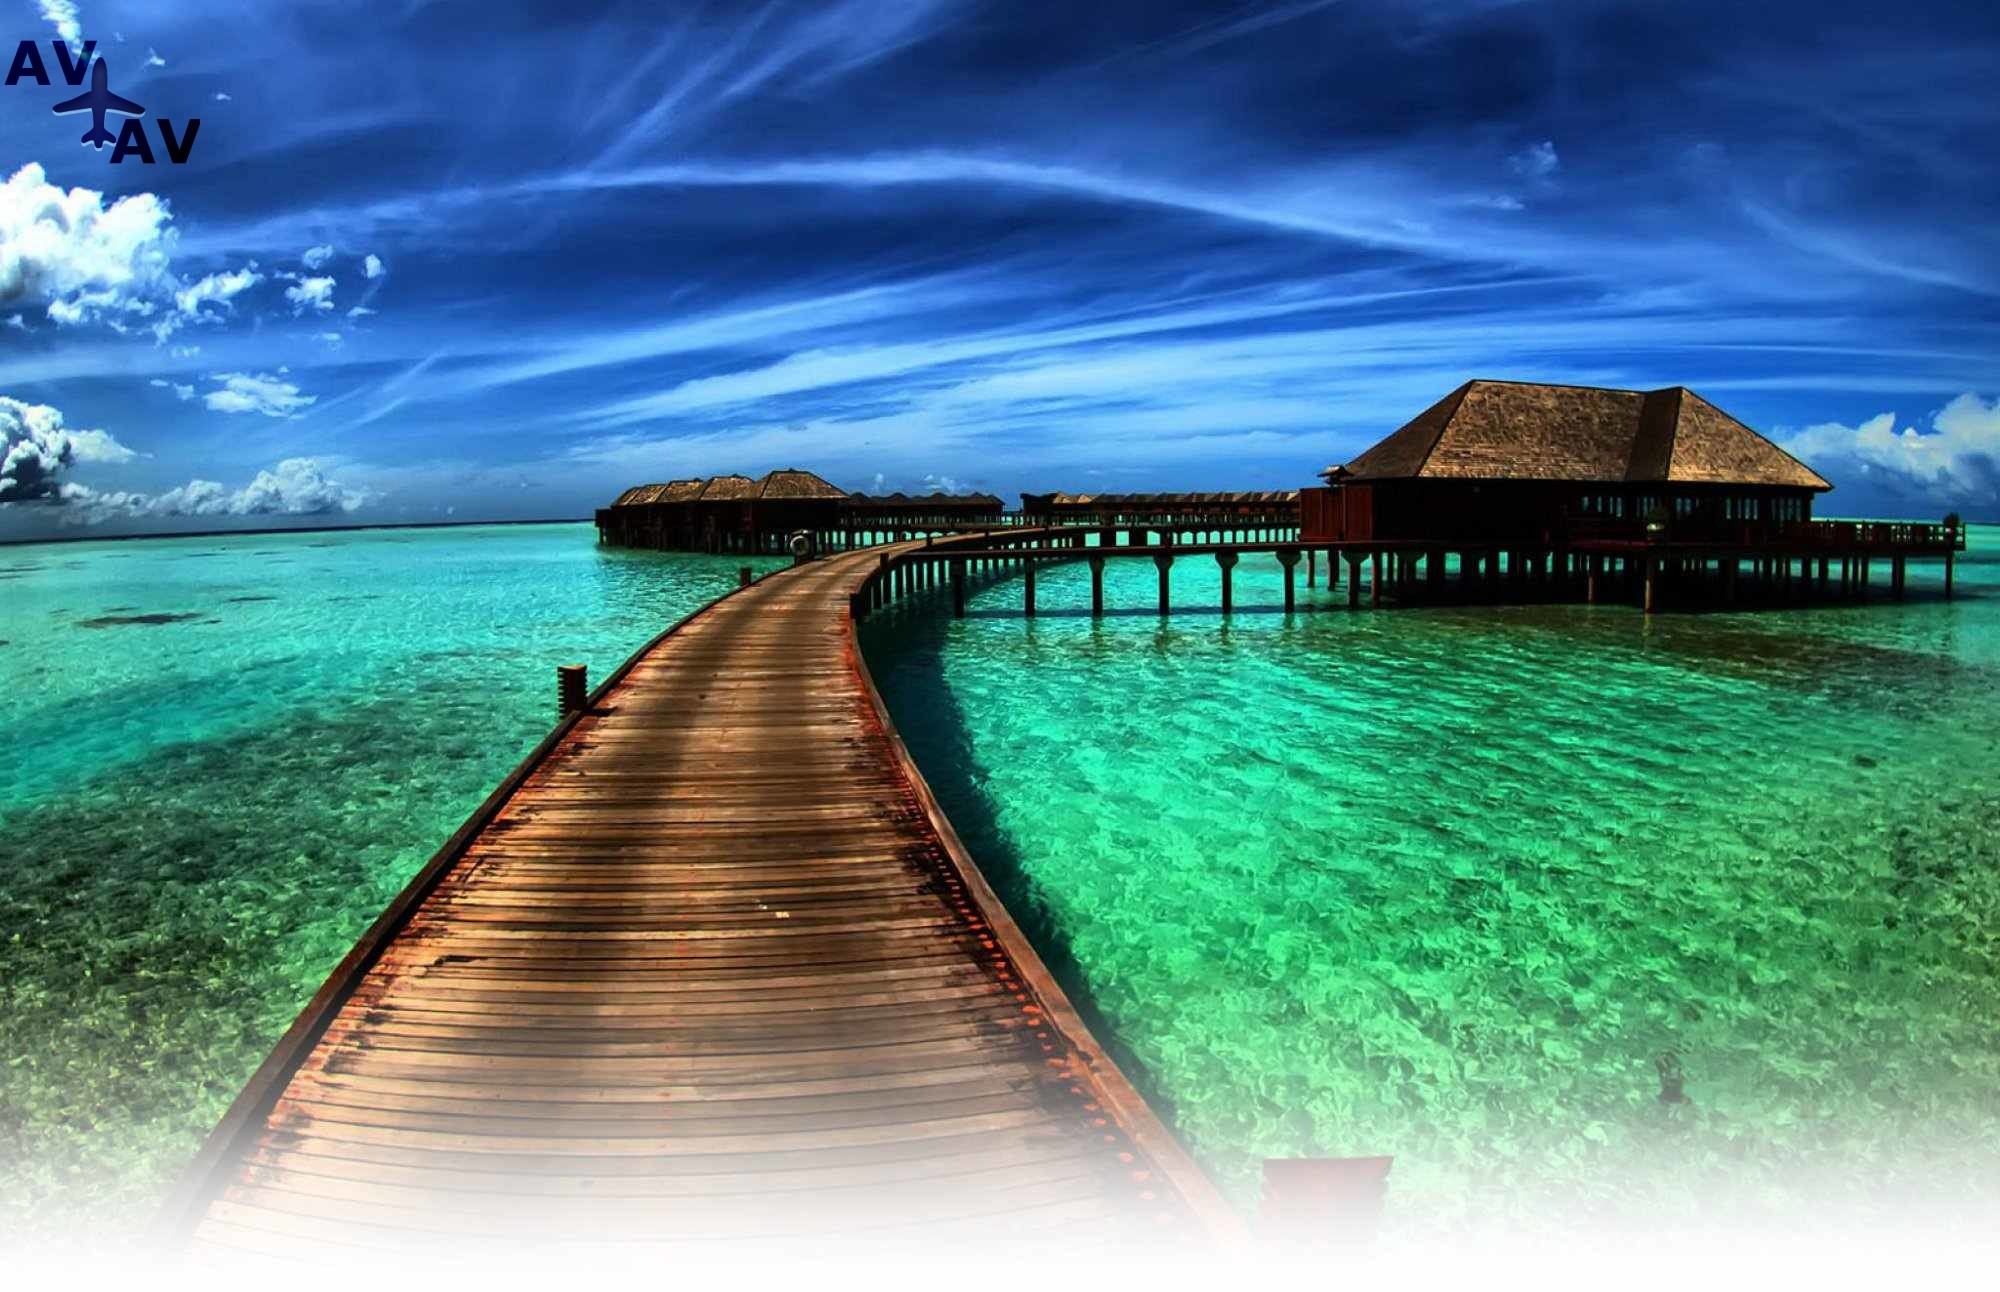 otdyih na maldivah - Отдых на Мальдивах